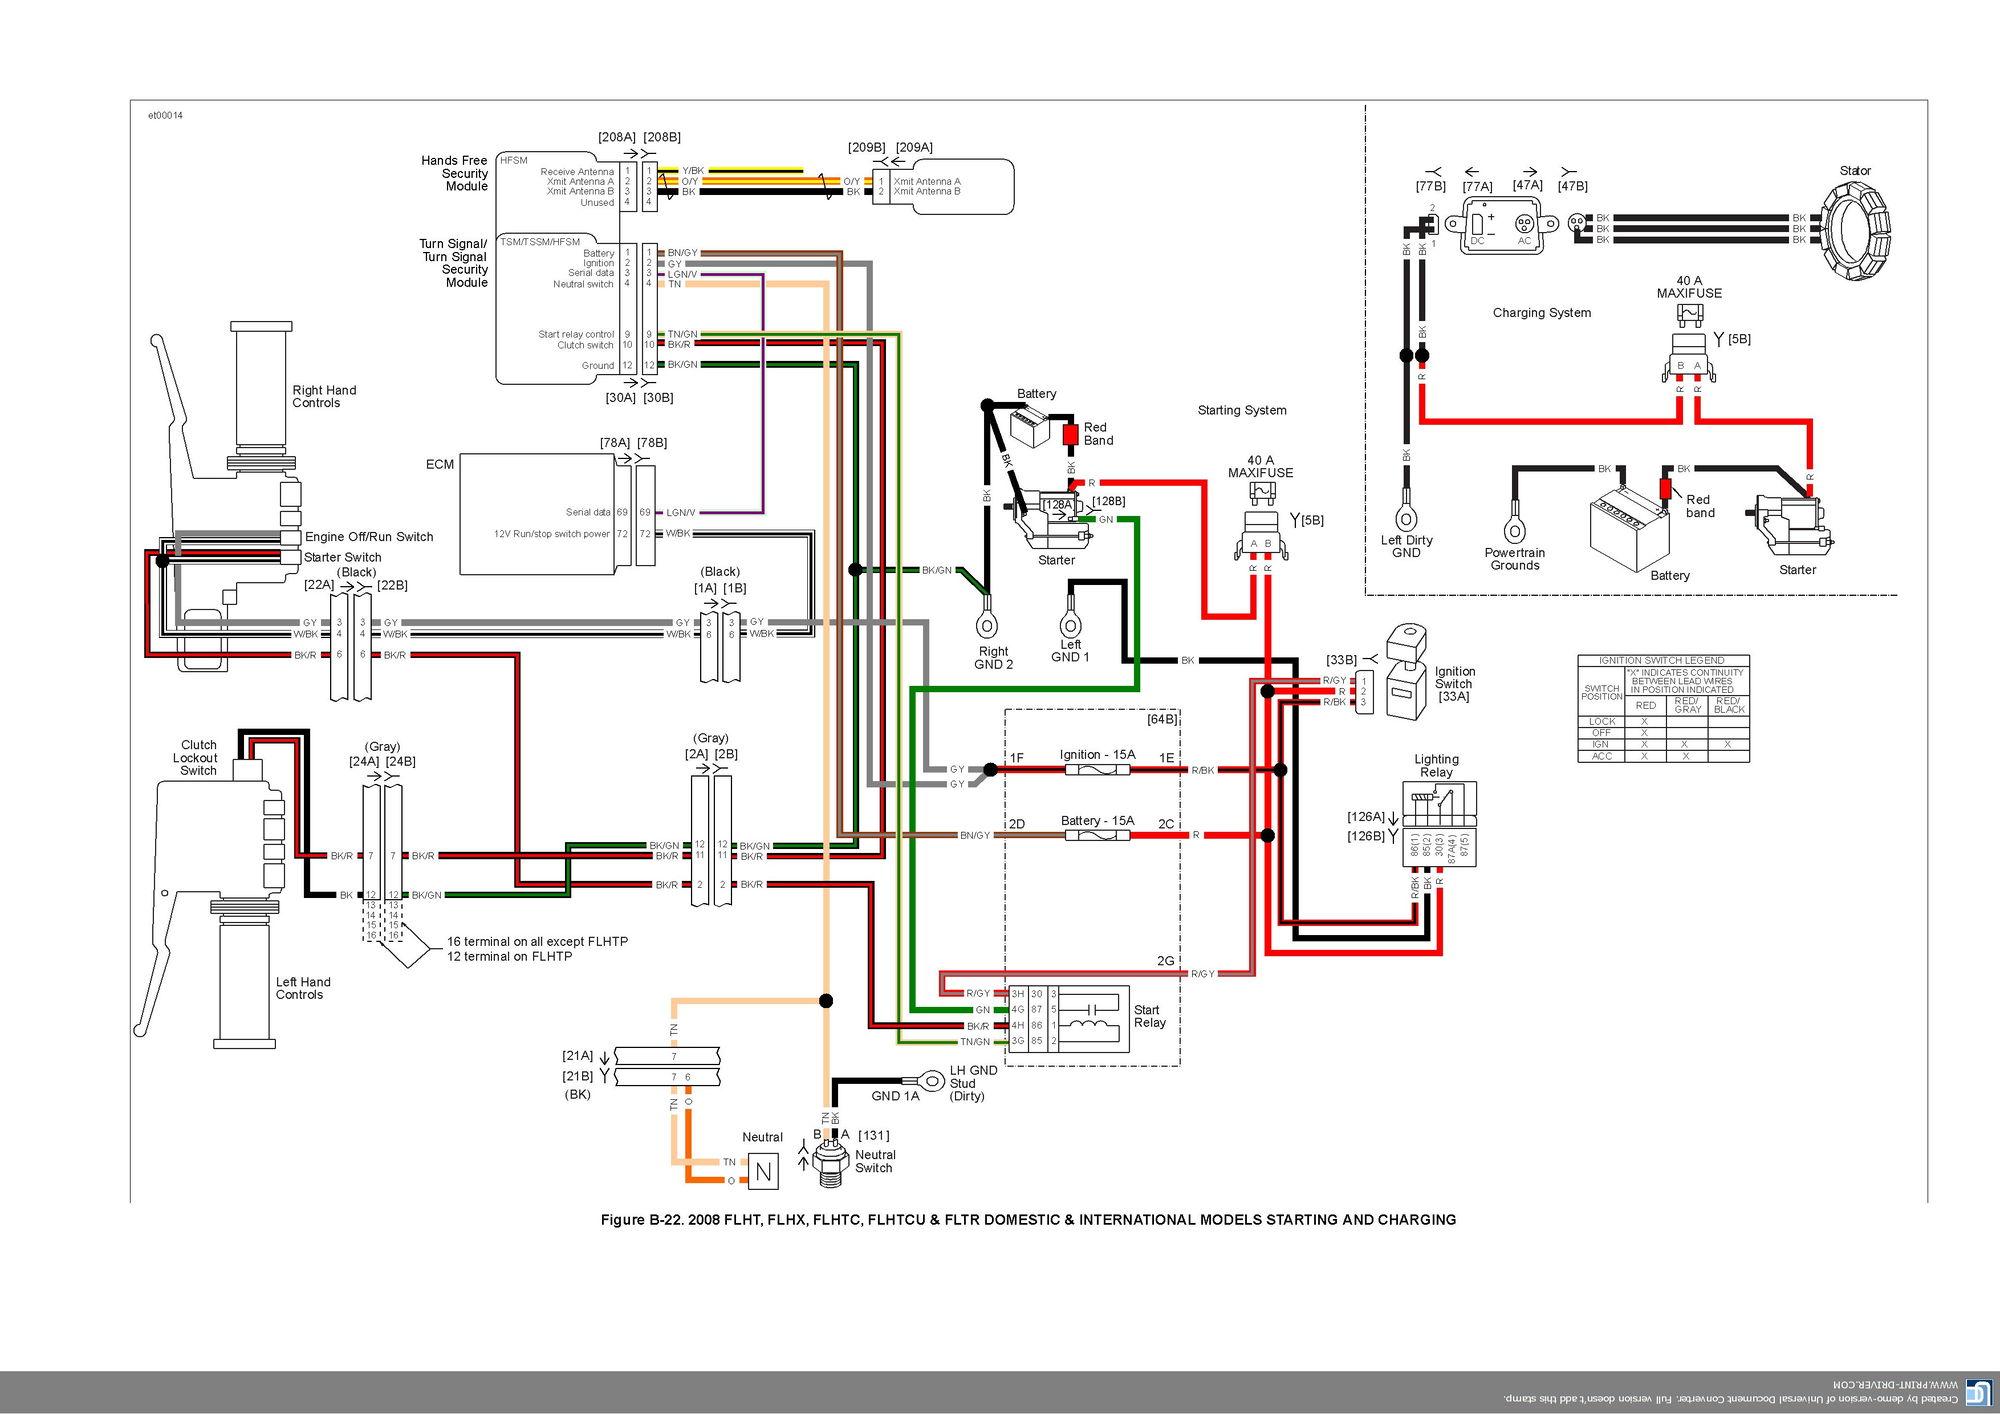 softail wiring diagram emg 81 85 solder 89 honda